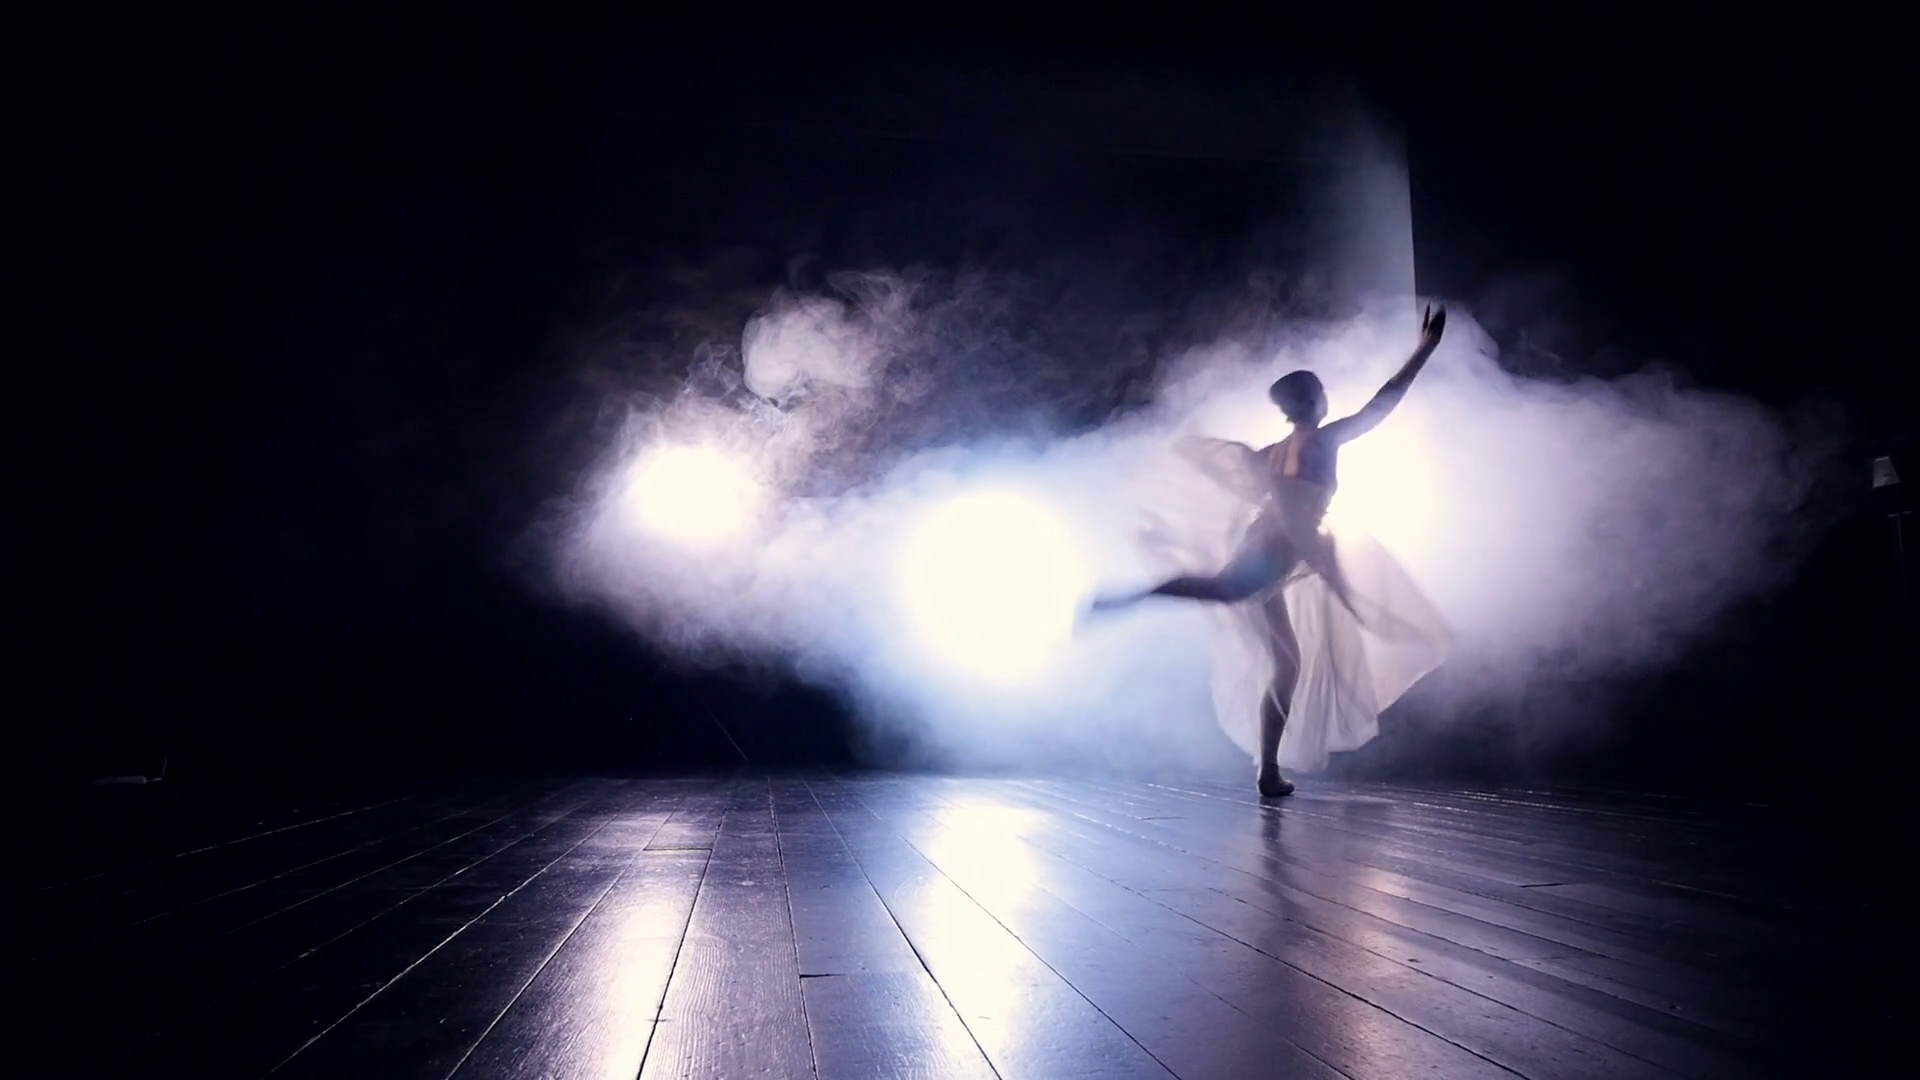 Ballet Dancer Wallpaper Posted By Ethan Mercado